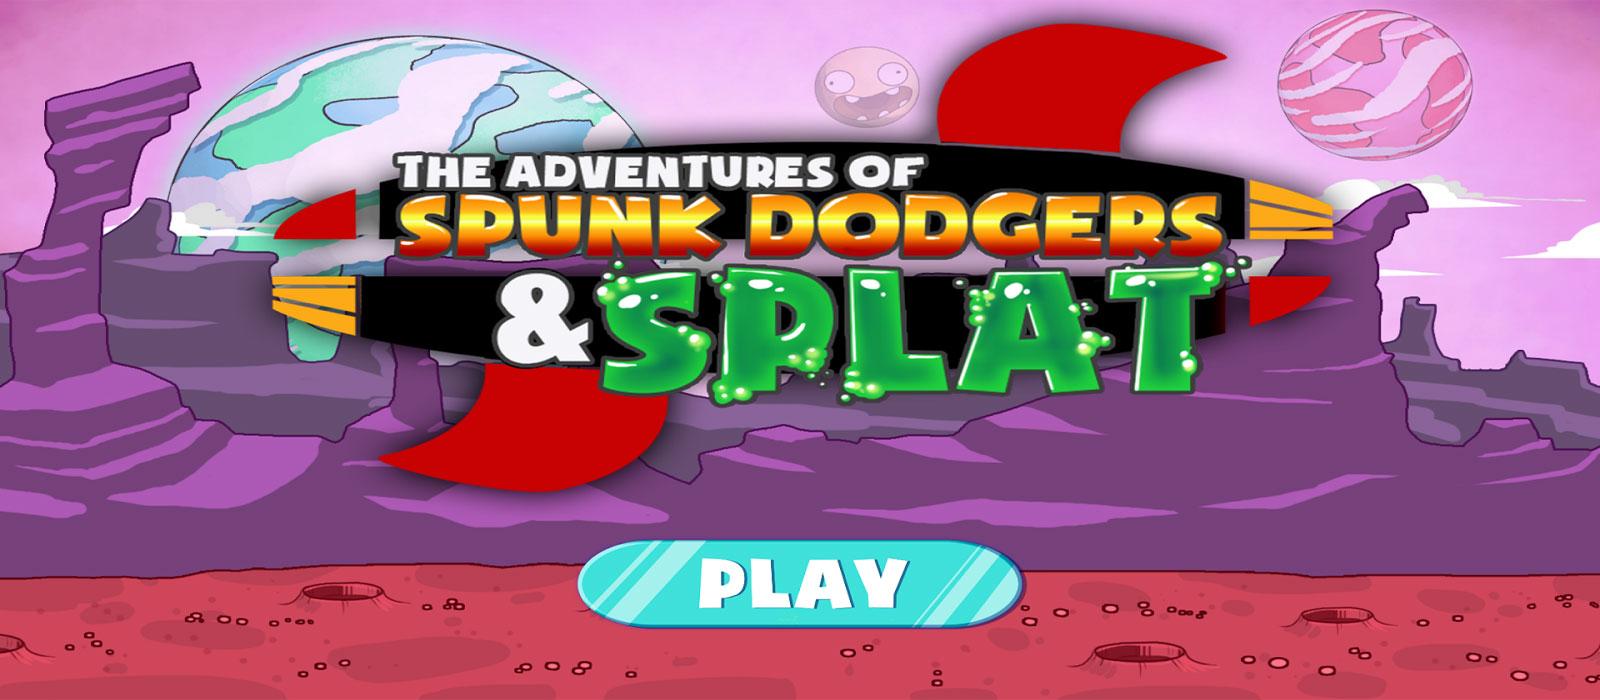 Spunk and Splat